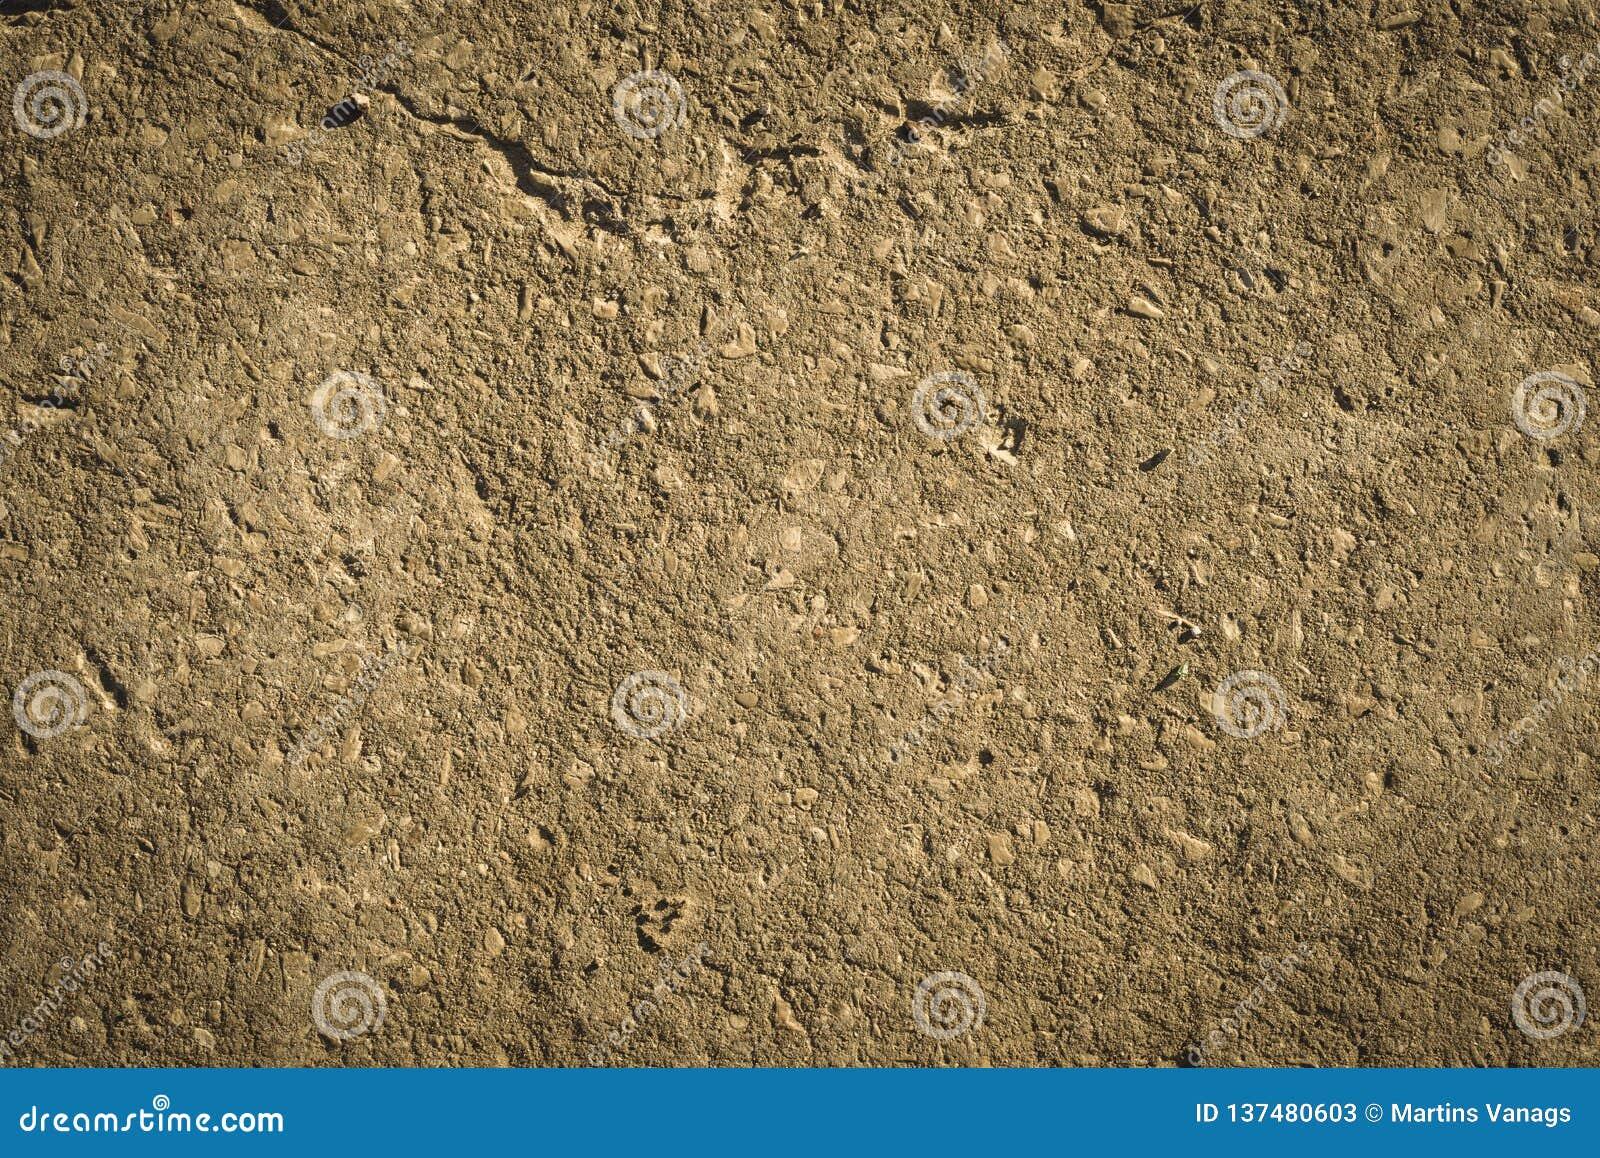 Sand pattern texture on the beach - vintage retro look. Sand pattern texture on the beach in cold weather at the Baltic sea - vintage retro look stock photos